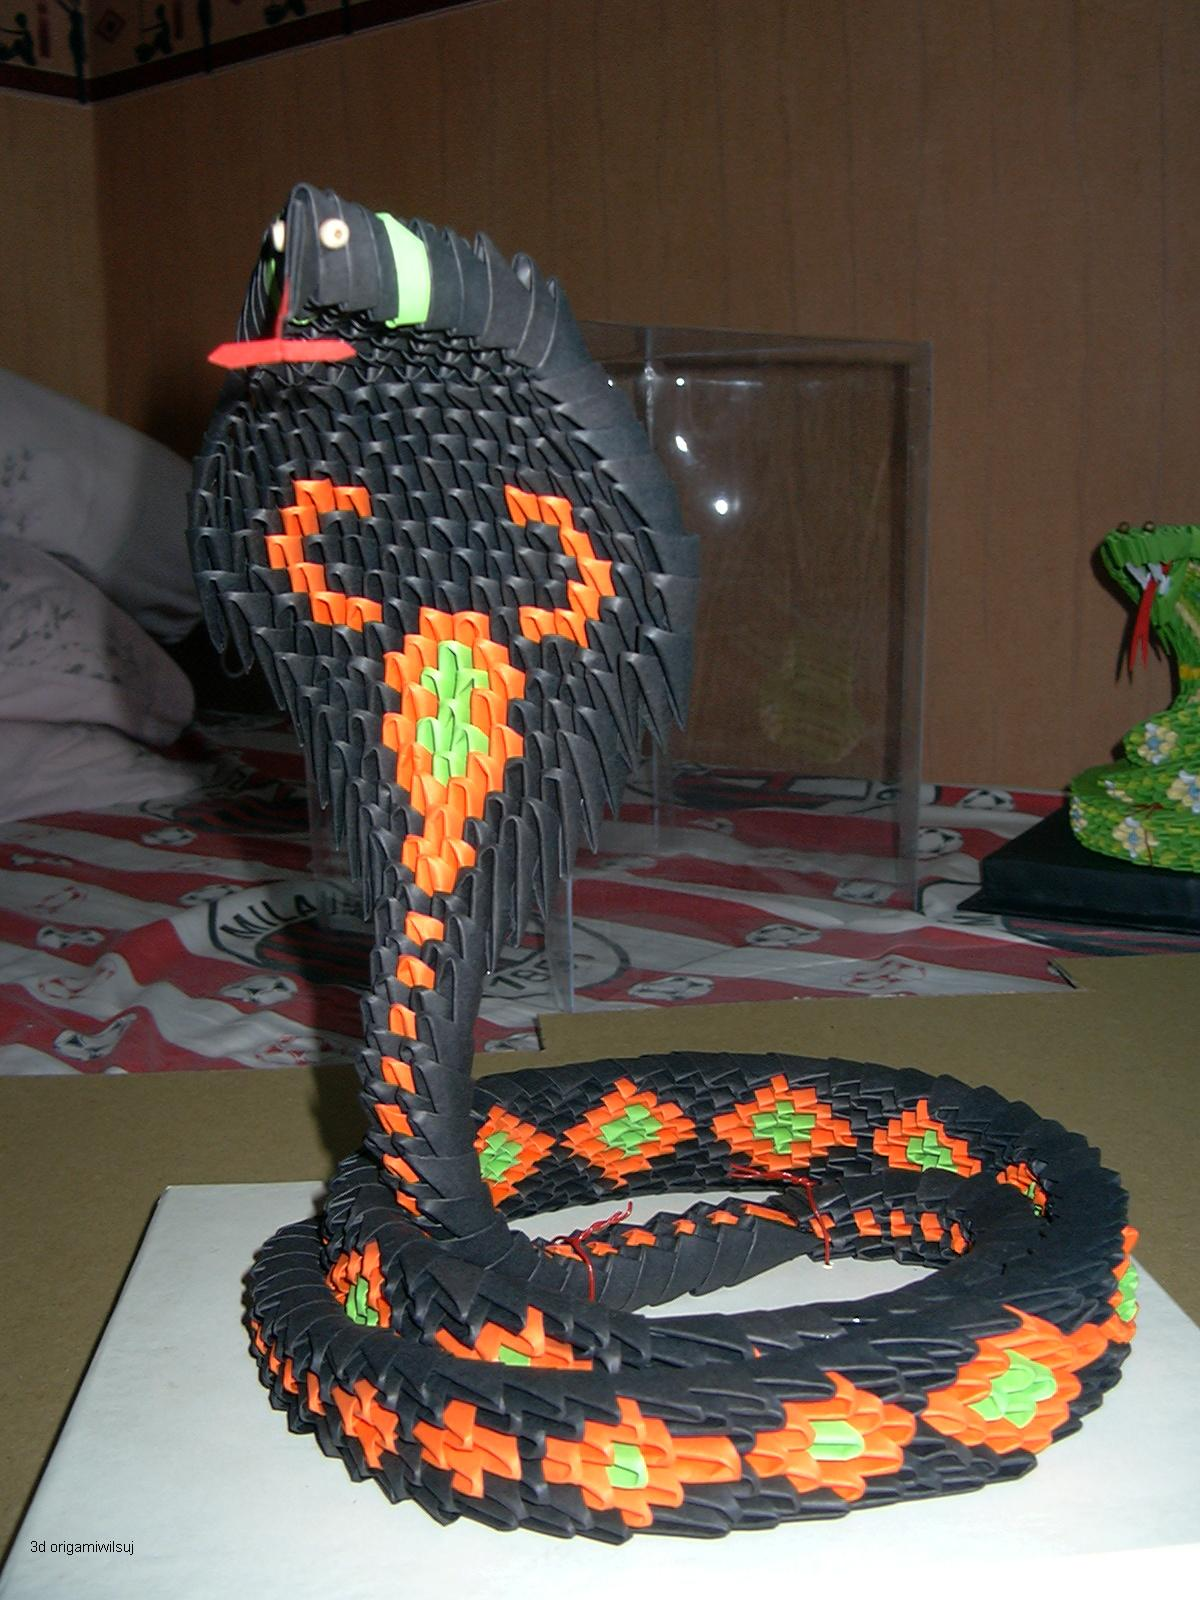 ICHANOKO 3D ORIGAMI INDONESIA: 3d origami - Animals snake ... - photo#42